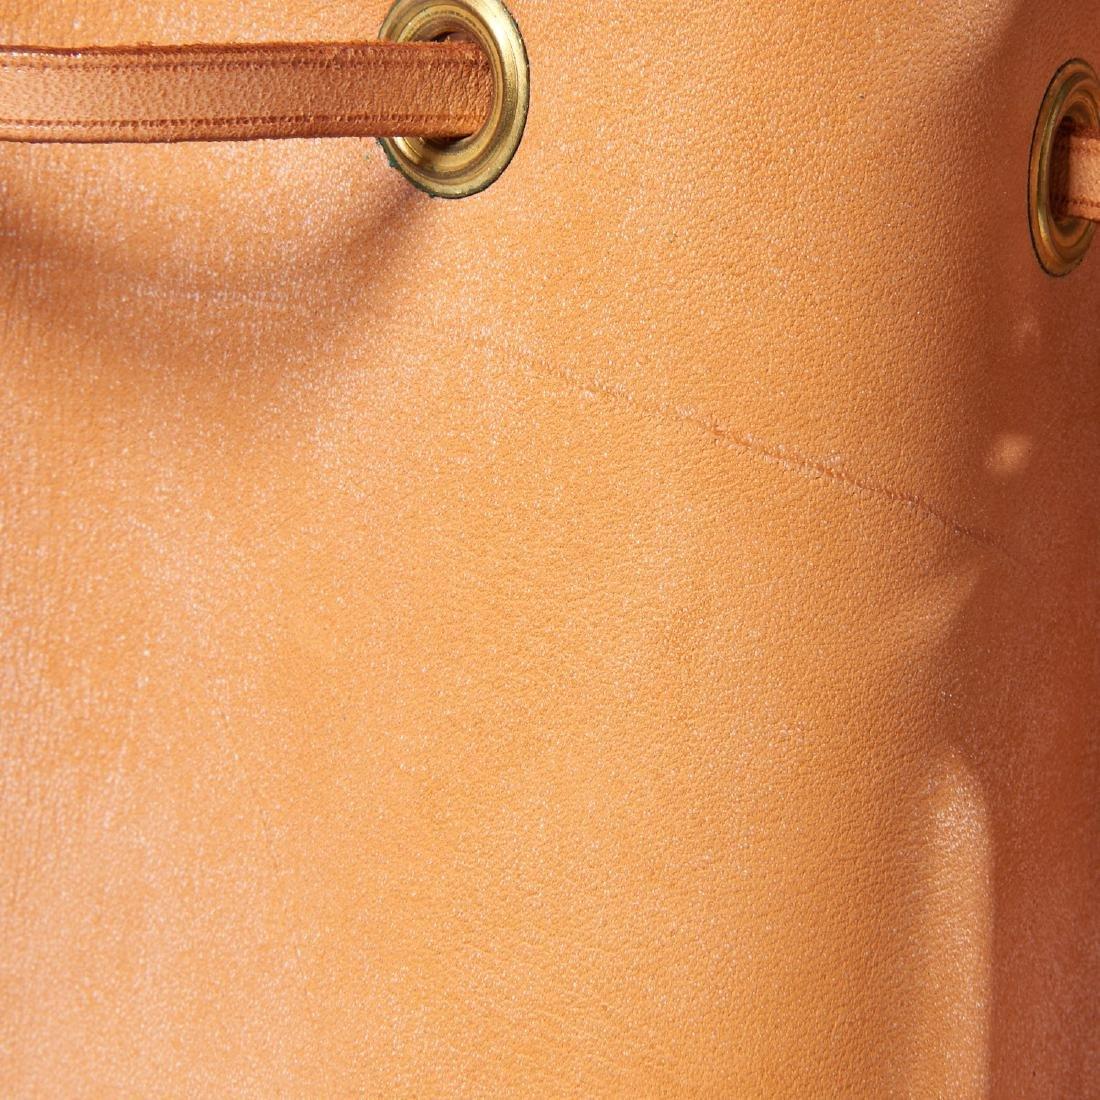 Louis Vuitton all leather drawstring handbag - 9